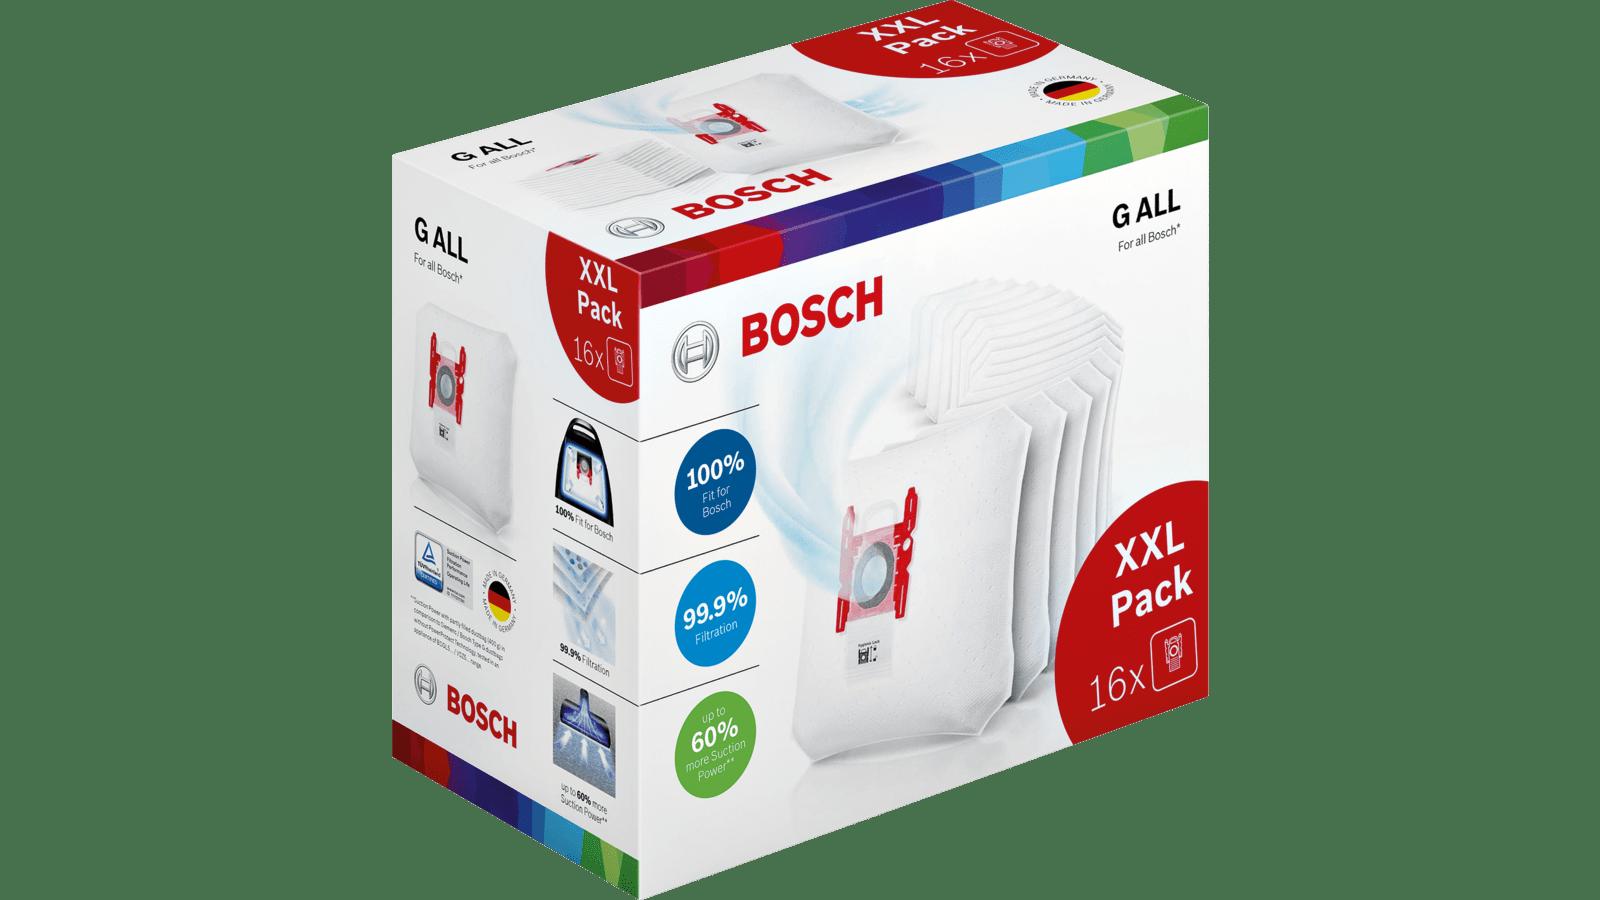 Støvsugerpose G All | Bosch